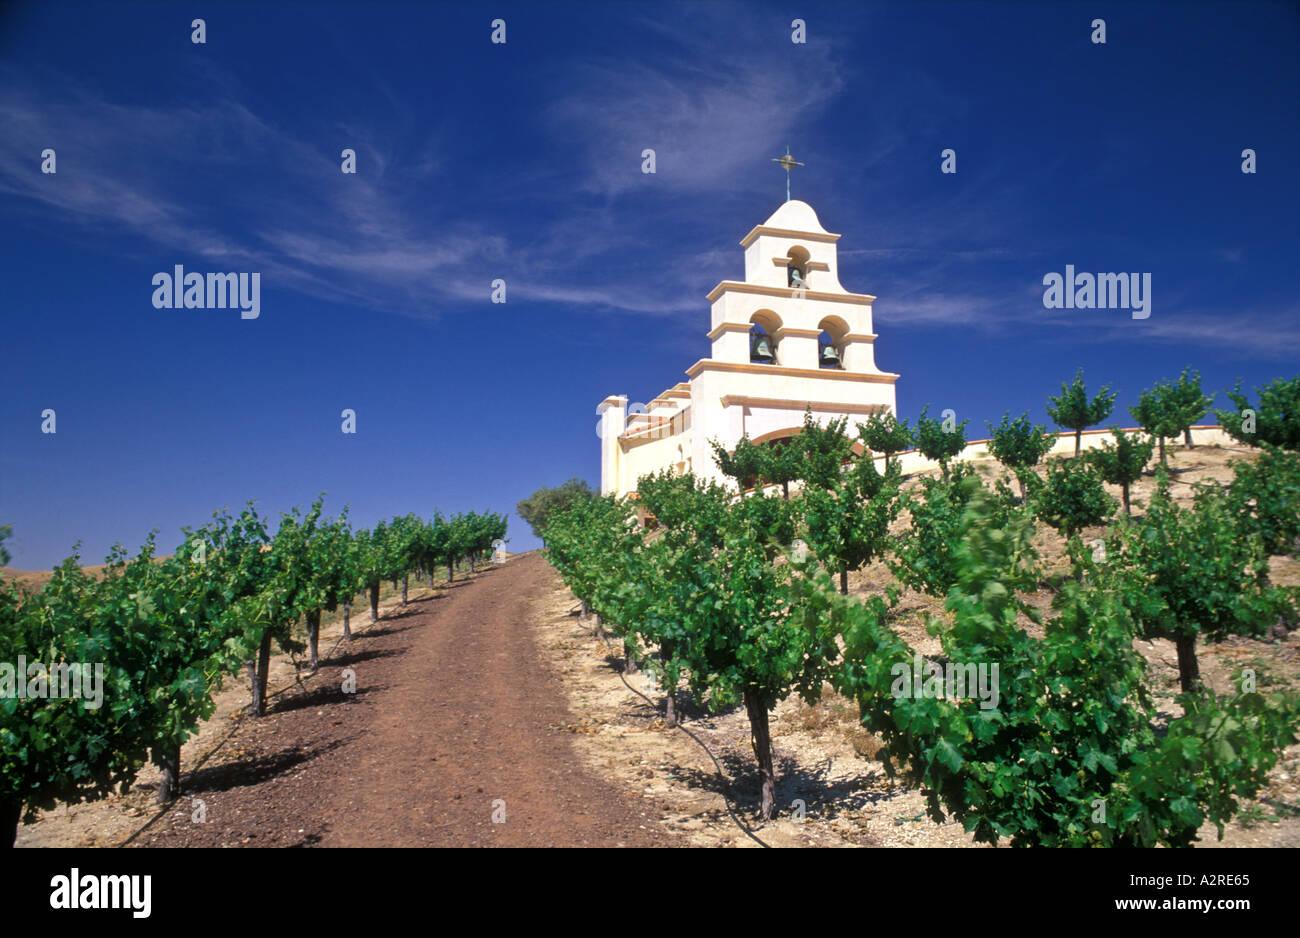 USA California Paso Robles Church on hill with grape vineyard Stock Photo